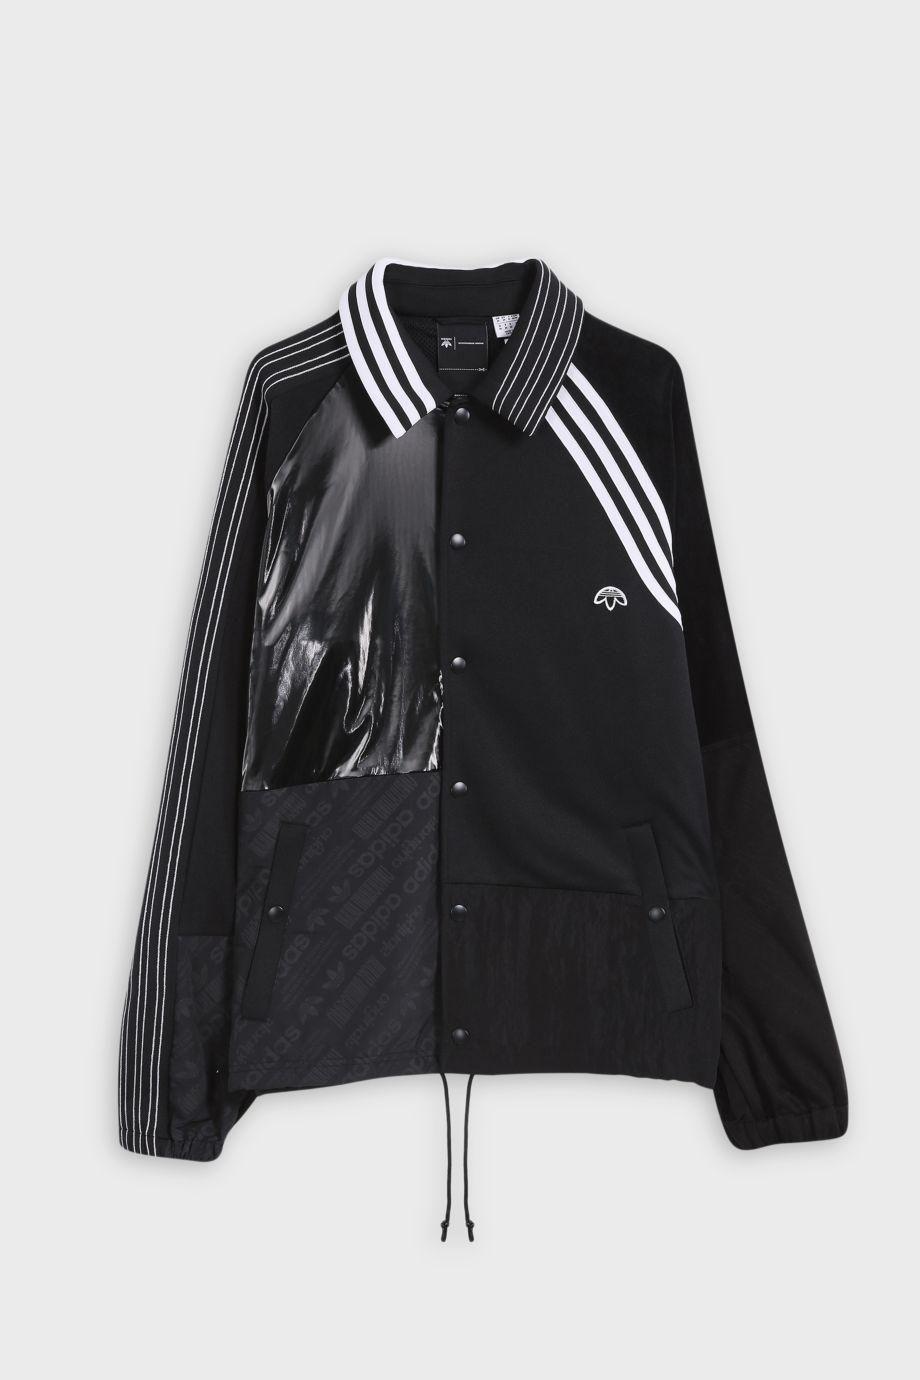 x alexander wang patch giacca pinterest alexander wang, adidas